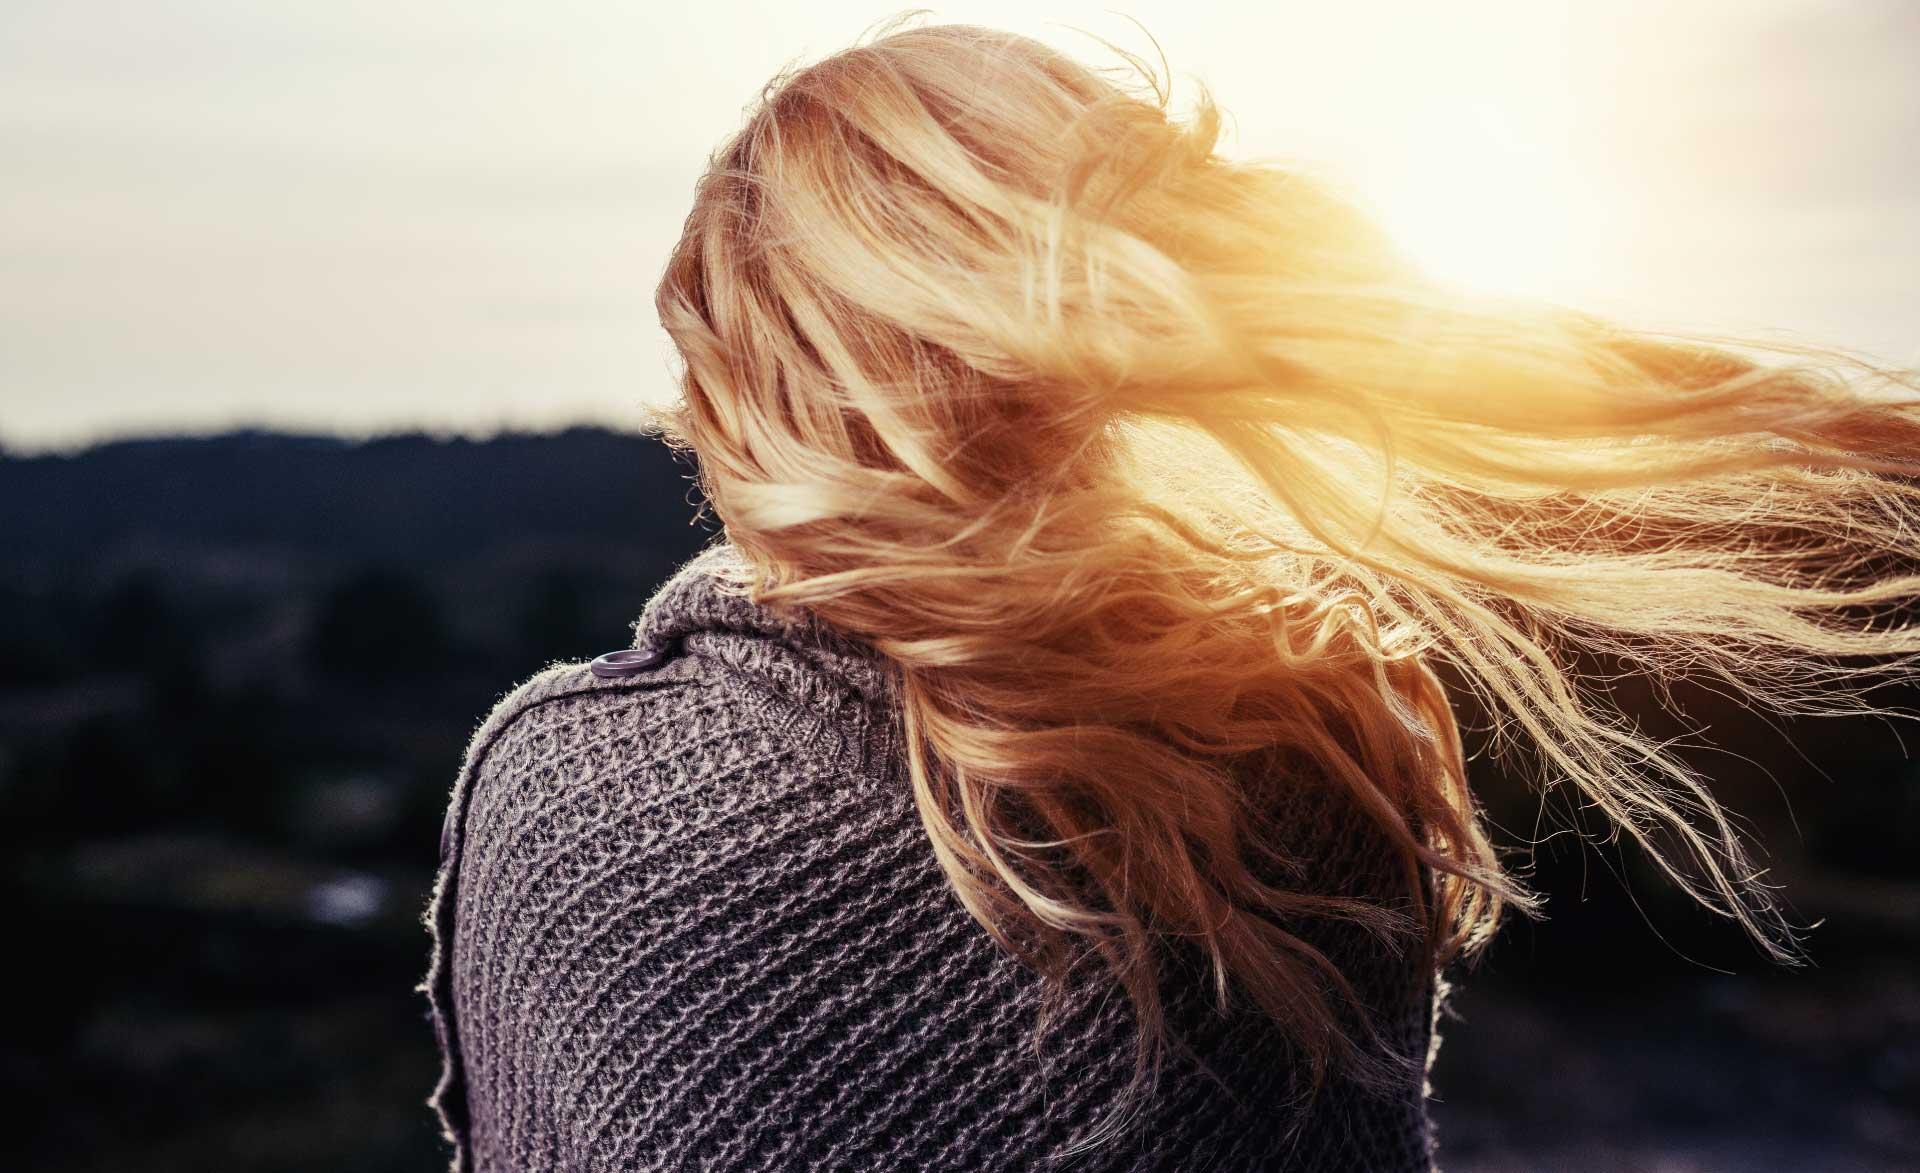 protesi capelli donna ferrara su misura impianto capillare membrana parrucca femminile patch cutanea